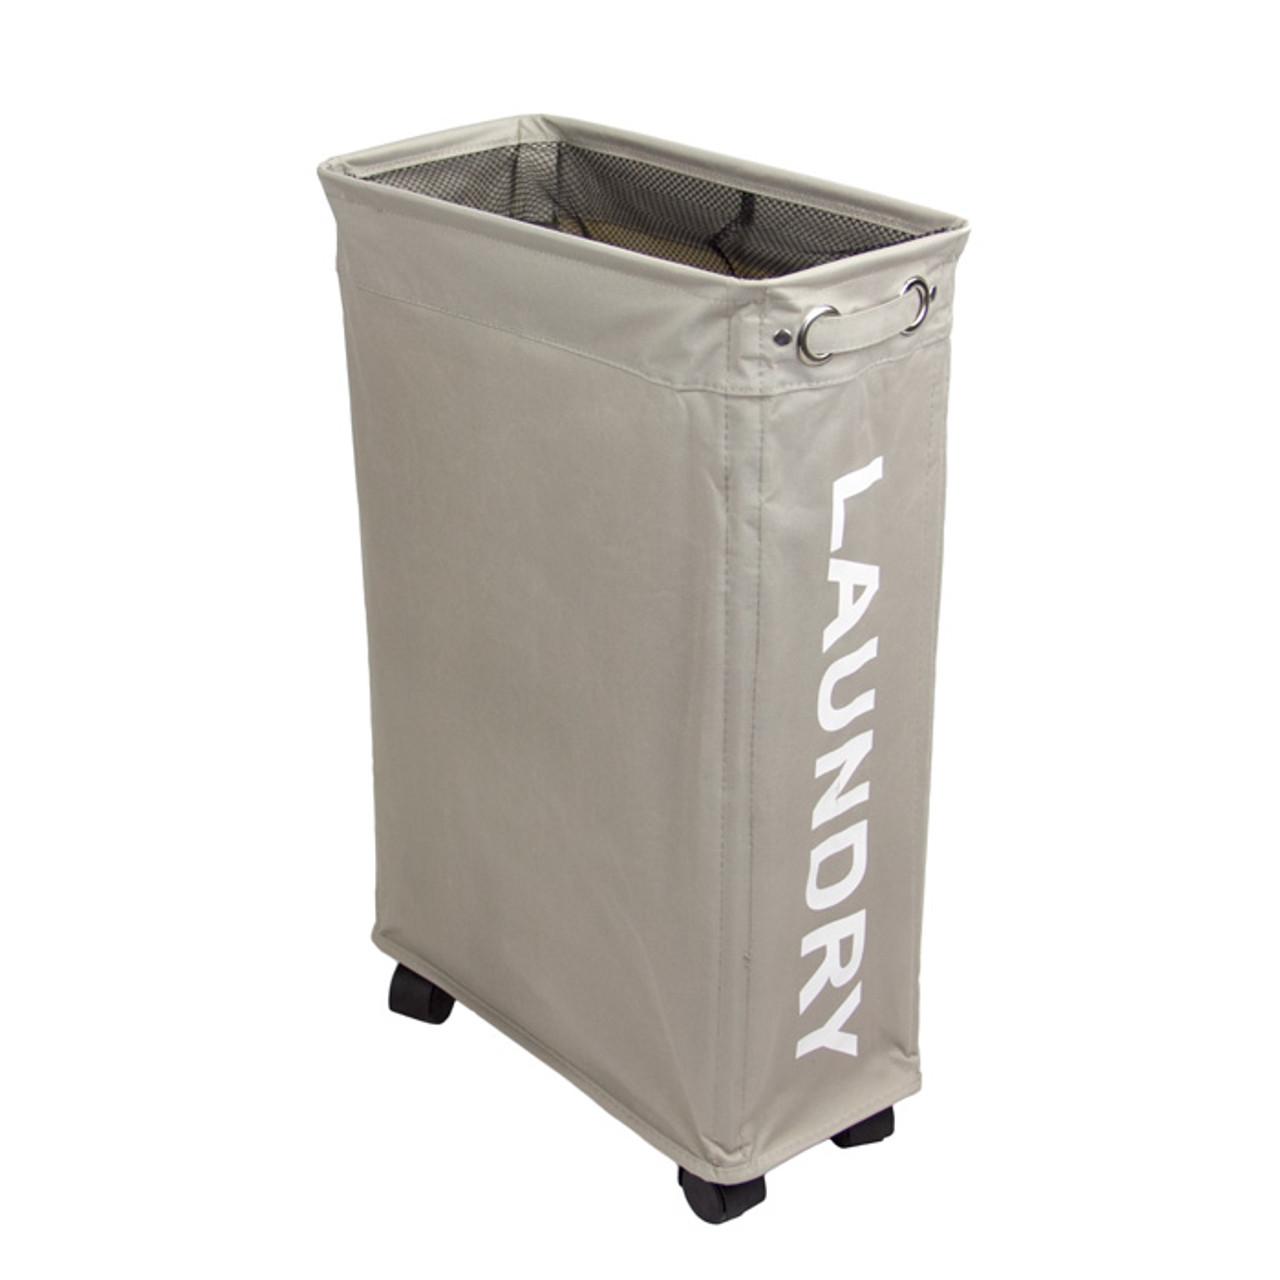 slim mobile laundry basket solutions your organized. Black Bedroom Furniture Sets. Home Design Ideas